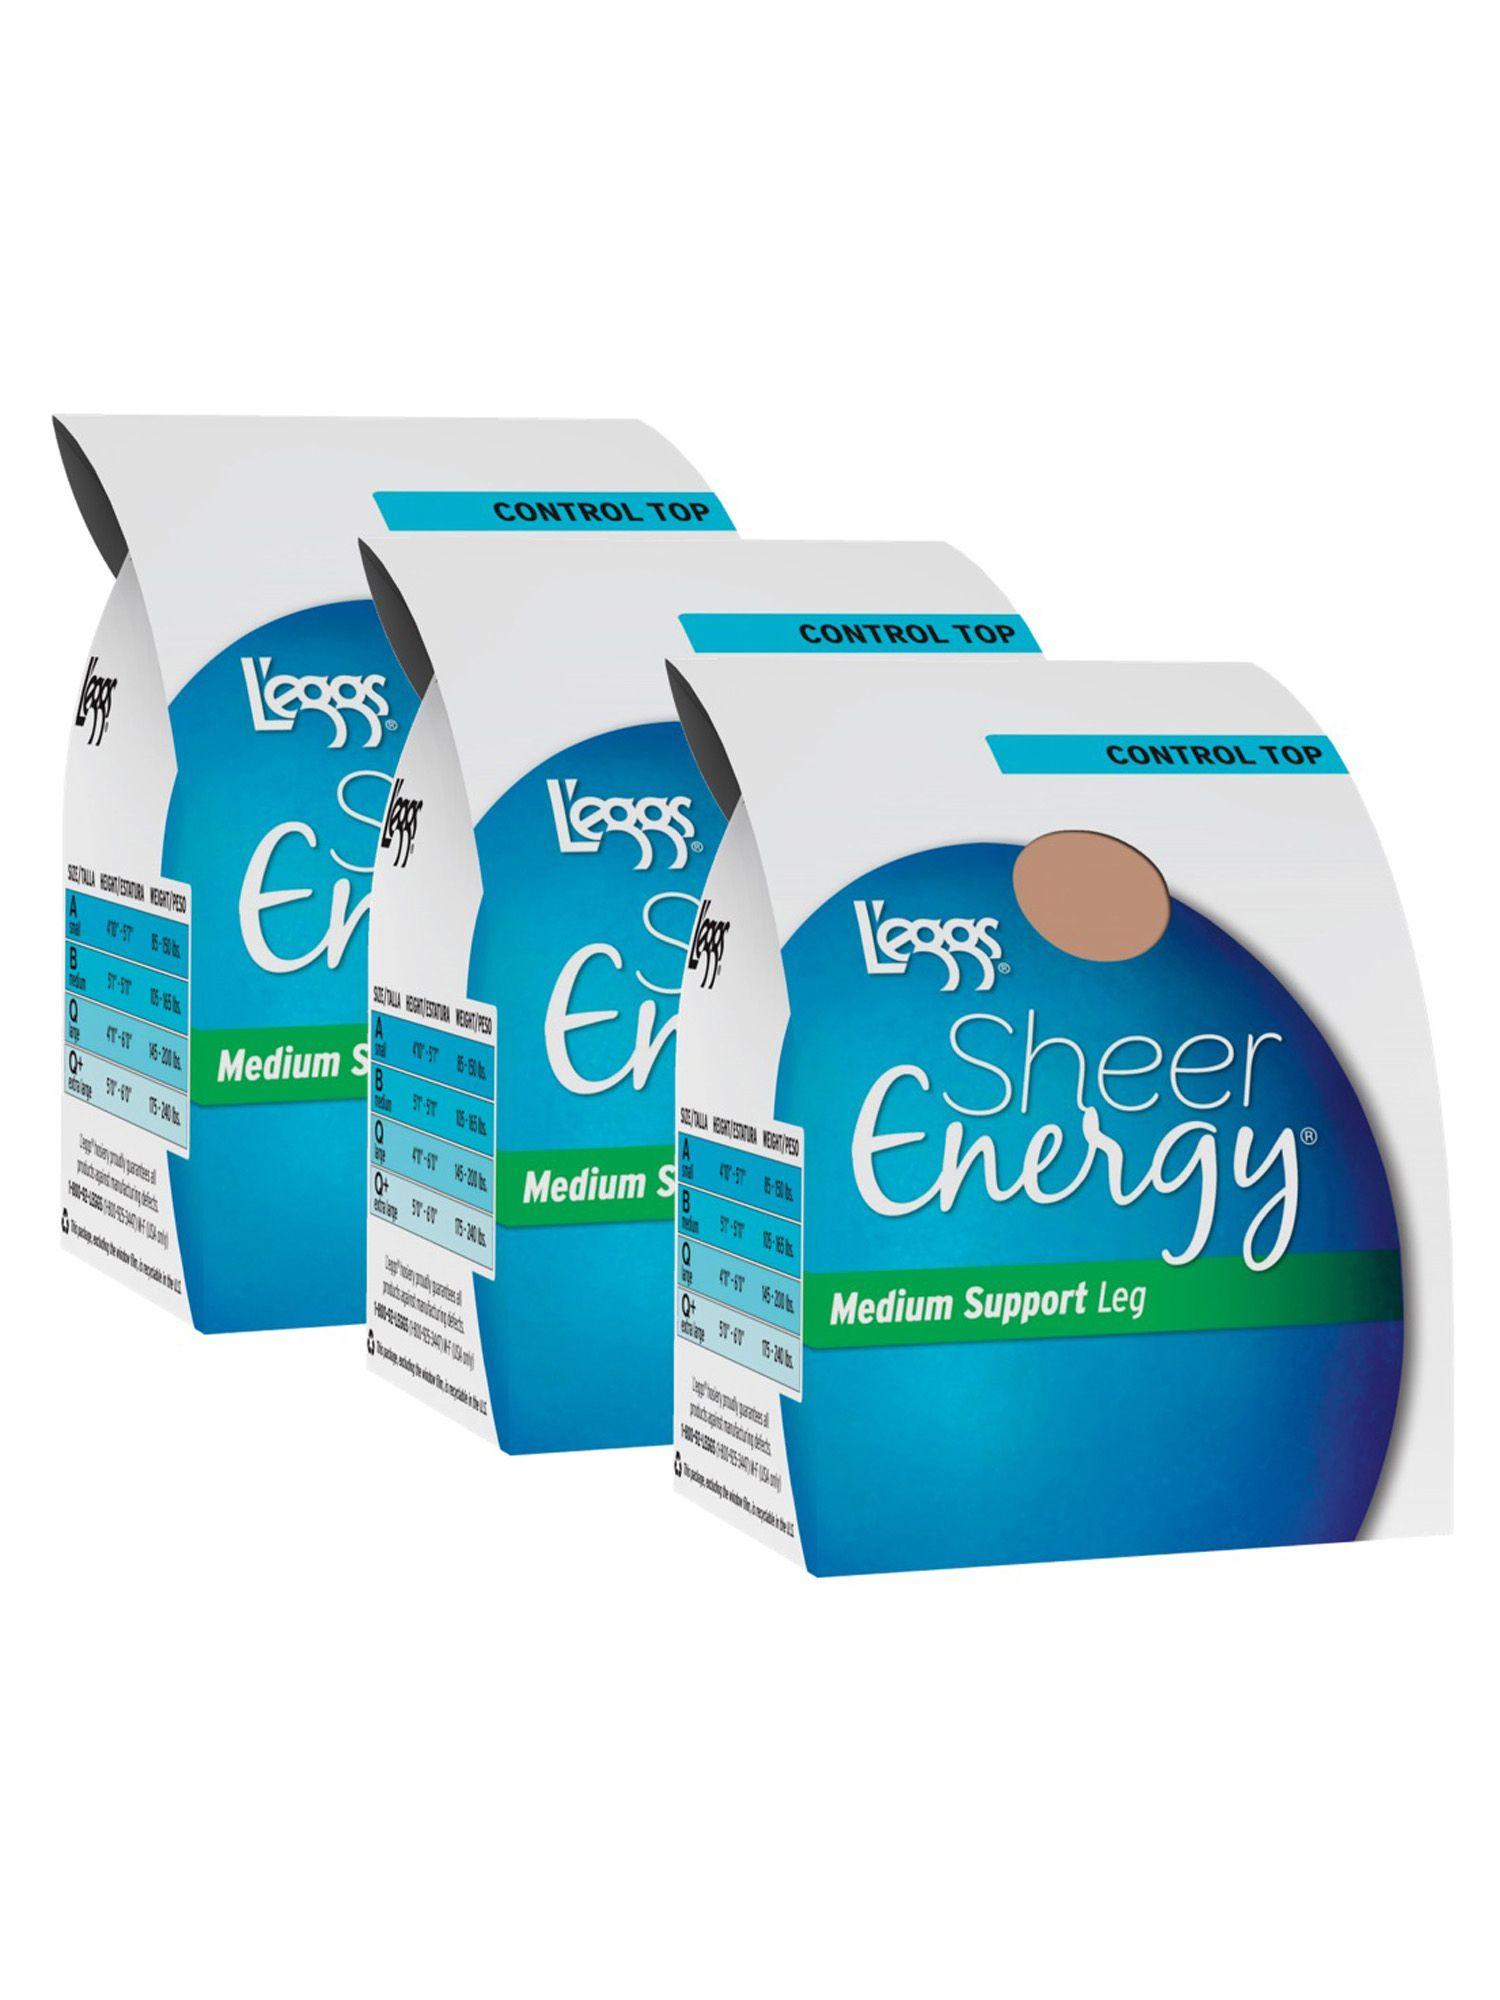 L'eggs Sheer Energy Medium Support Control Top Hosiery, 3